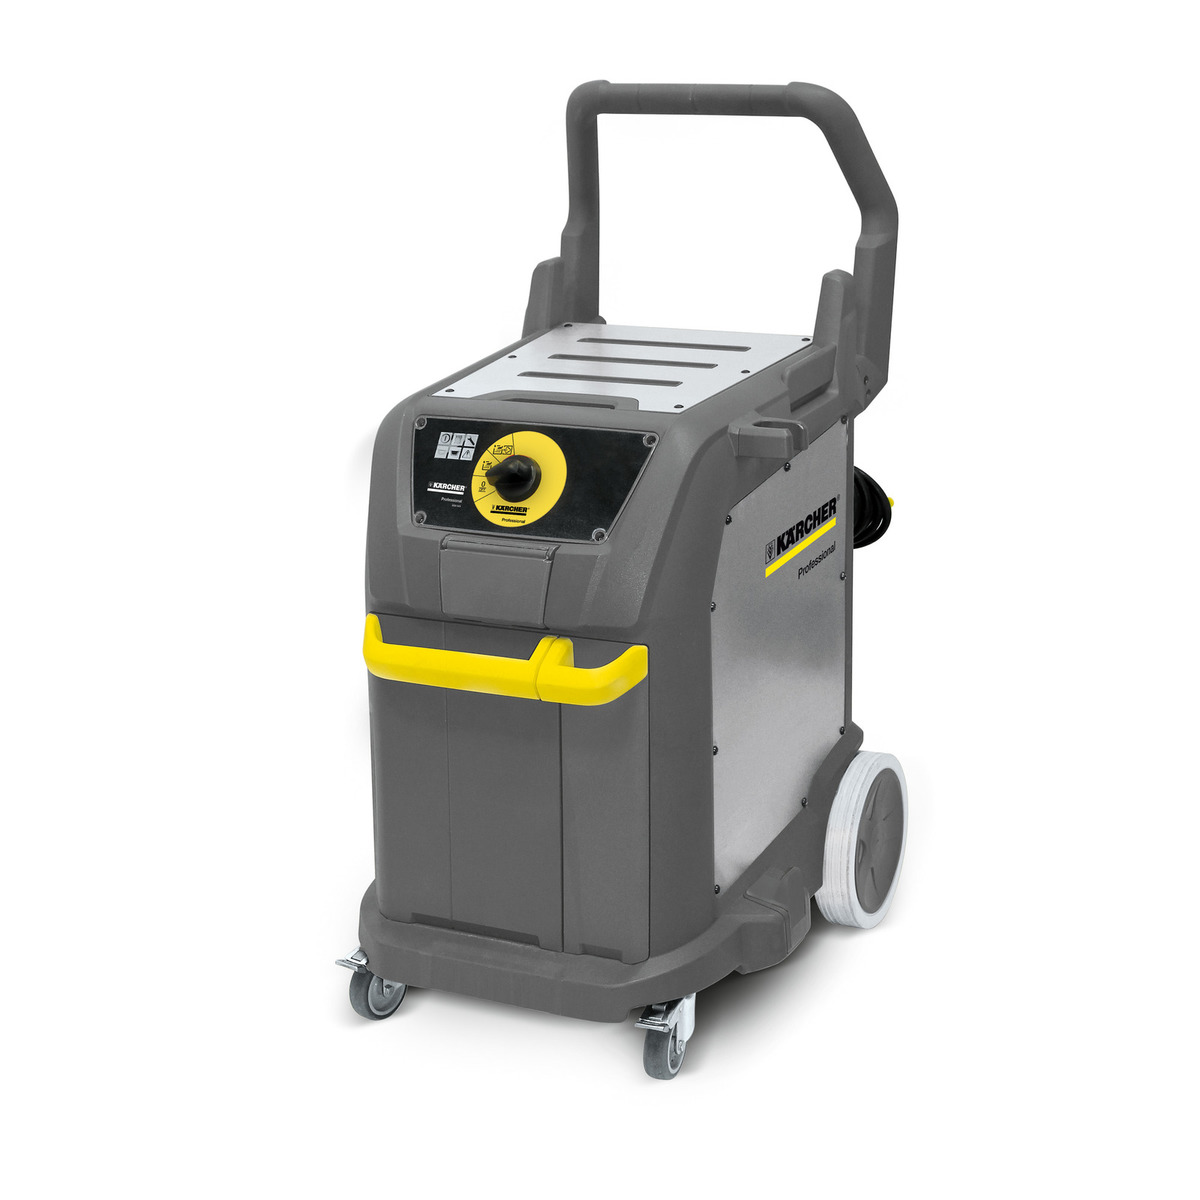 SGV 6/5蒸汽真空清洗机